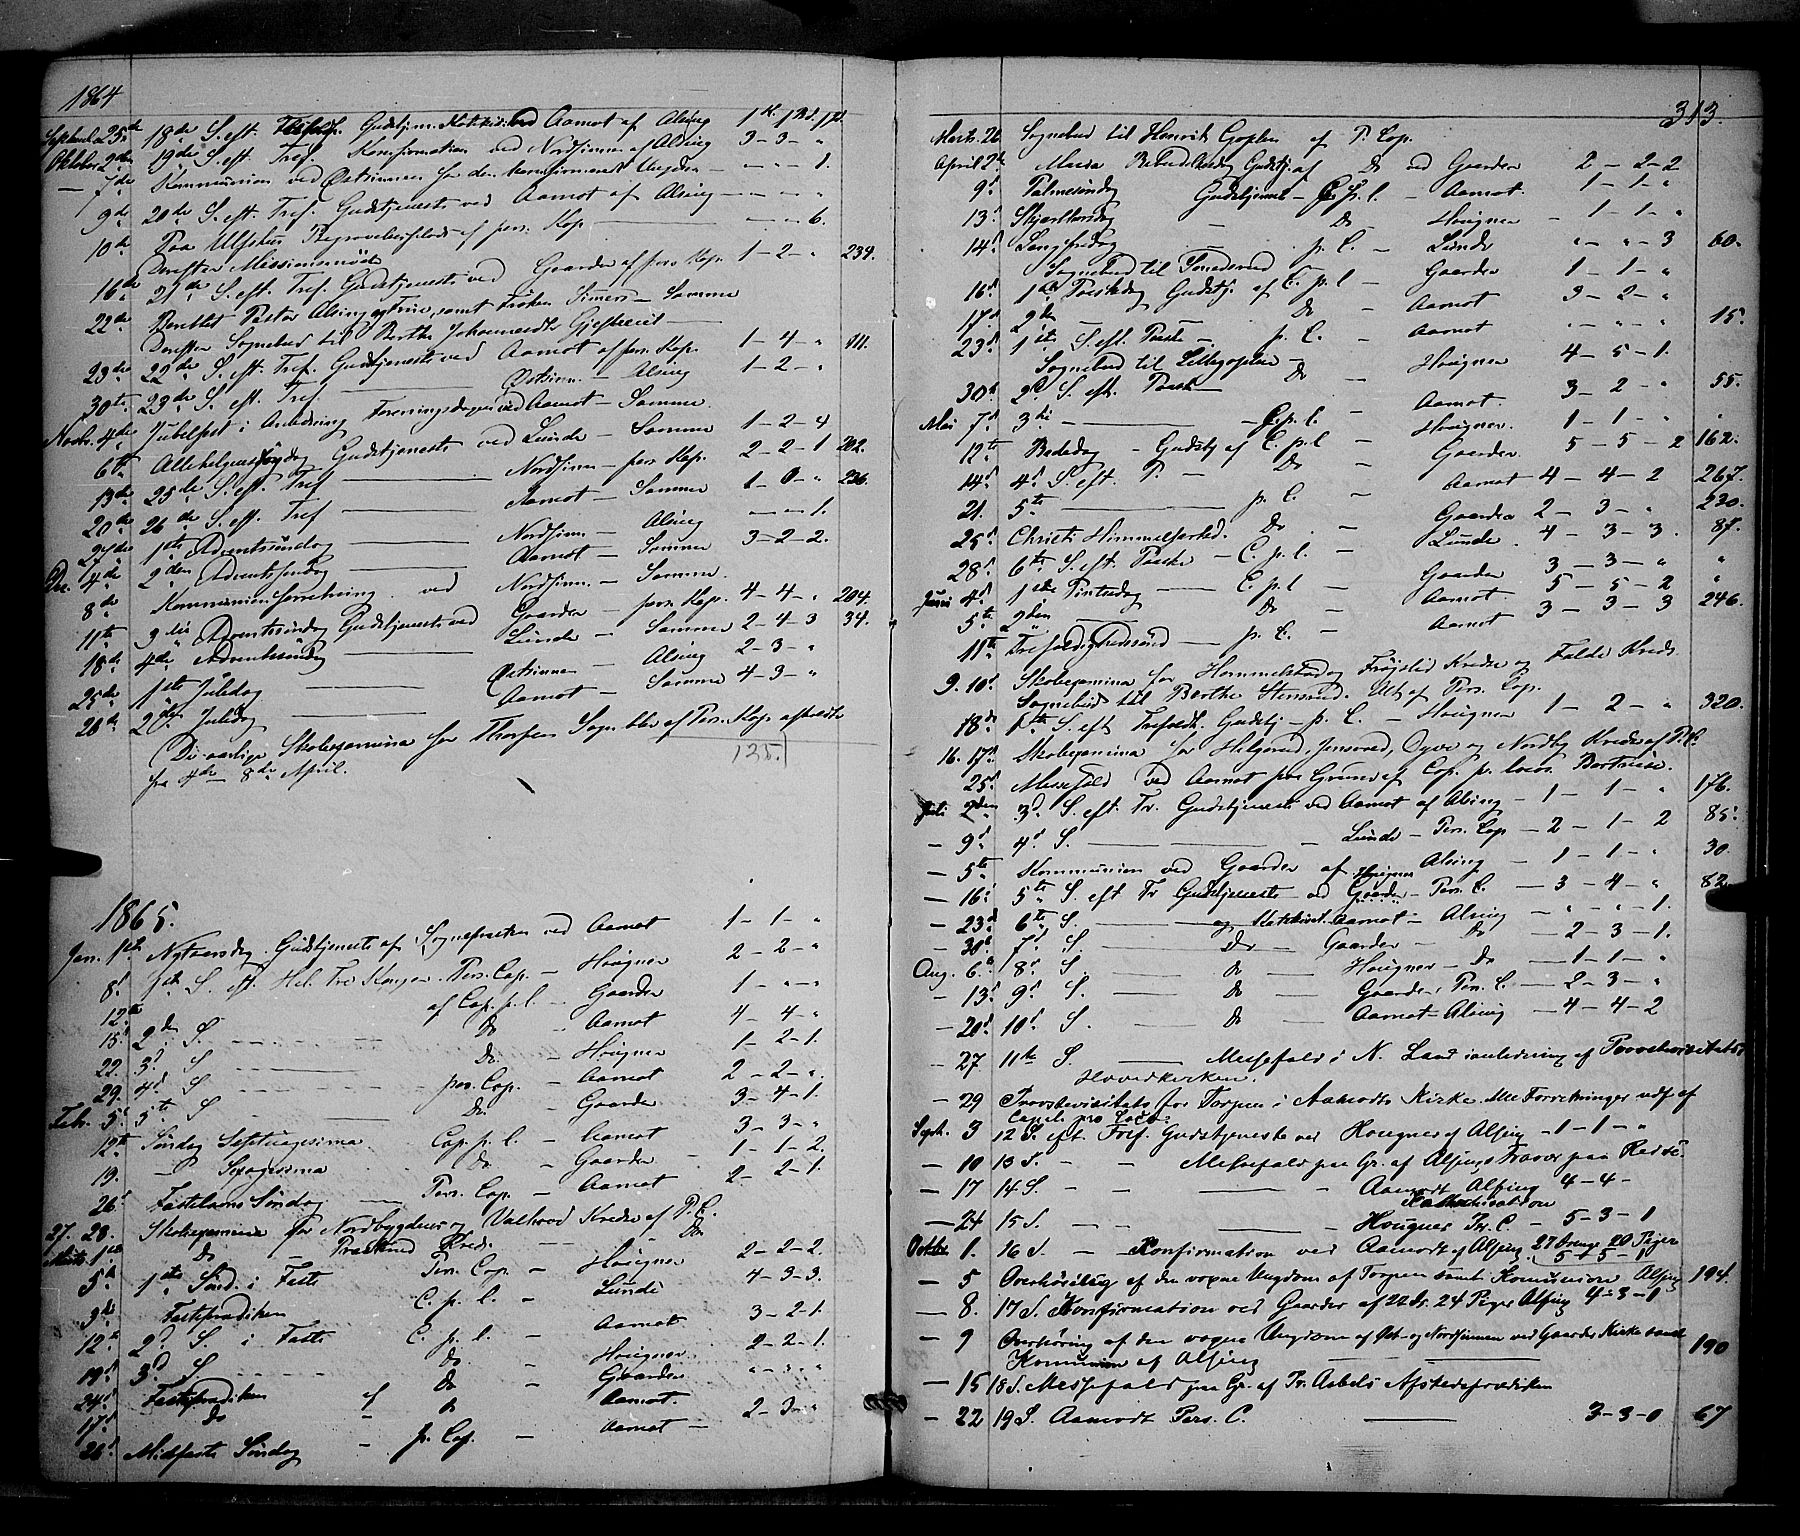 SAH, Nordre Land prestekontor, Ministerialbok nr. 1, 1860-1871, s. 313